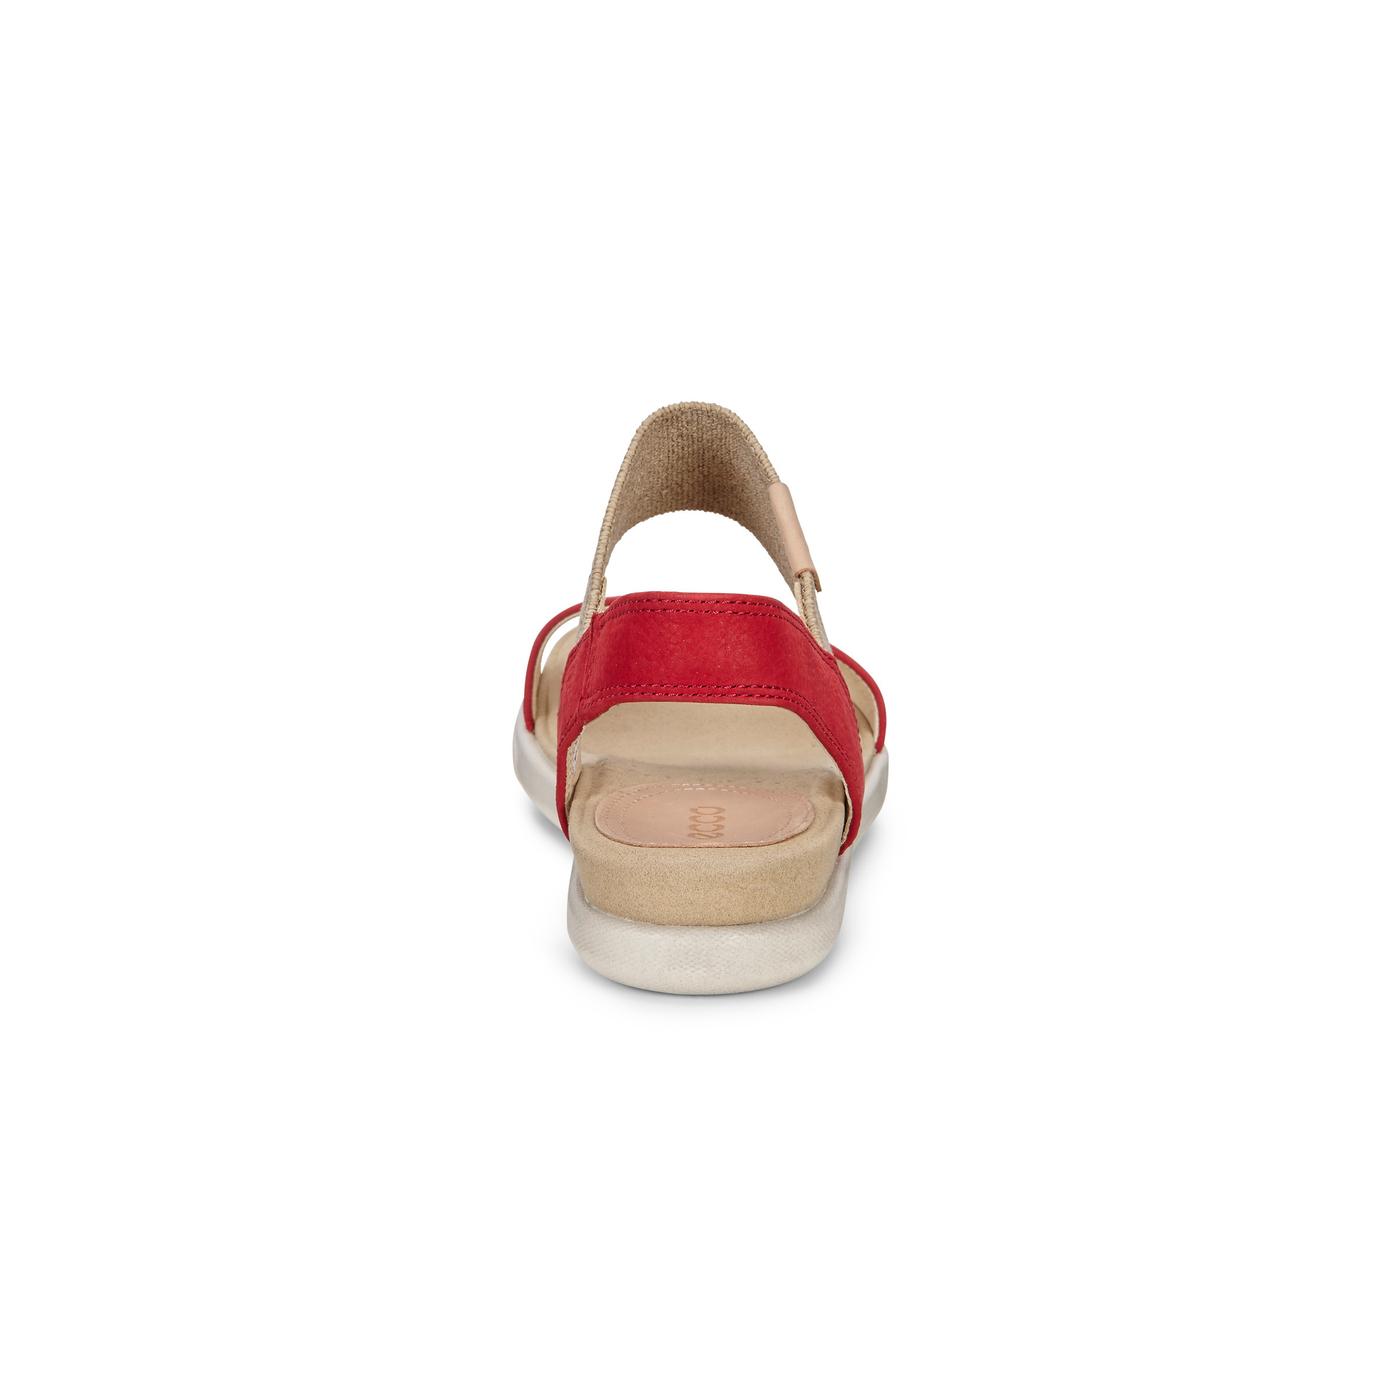 ECCO Damara Ankle Sandal